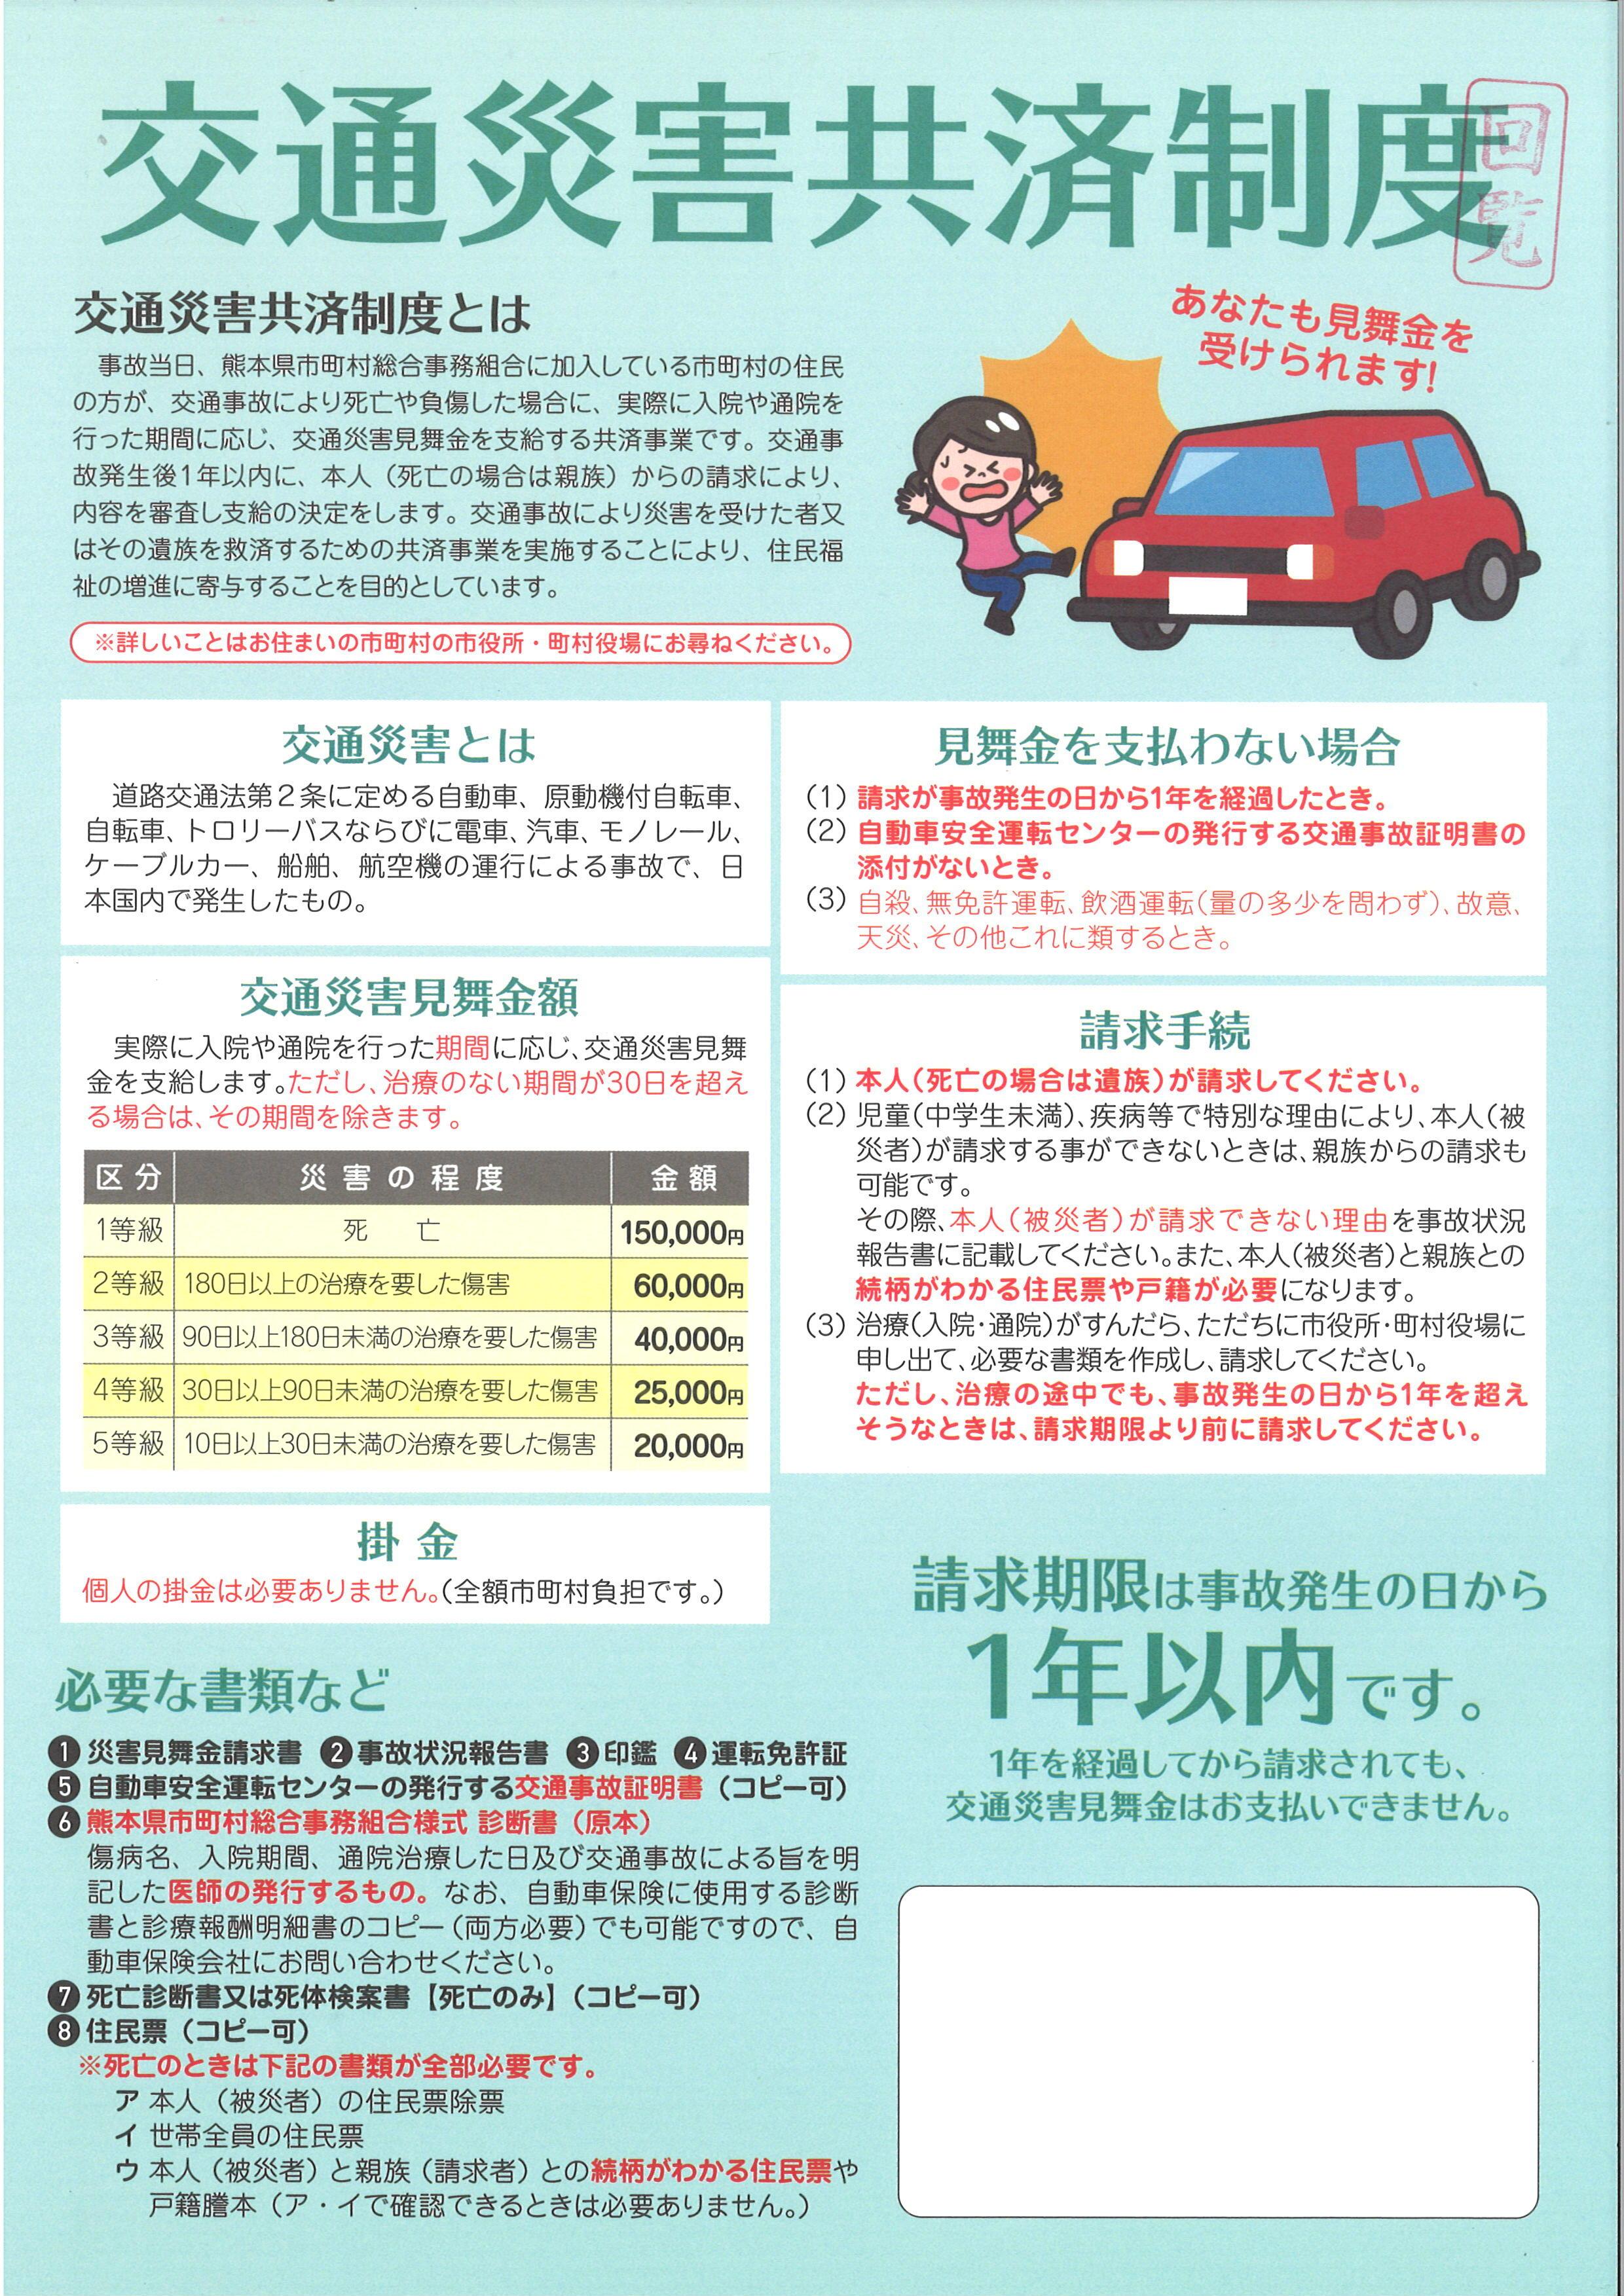 http://www.town.takamori.kumamoto.jp/chosha/somu/upload/9d478797a9e9ecbfe549fac21eeadf11be3d5040.jpg